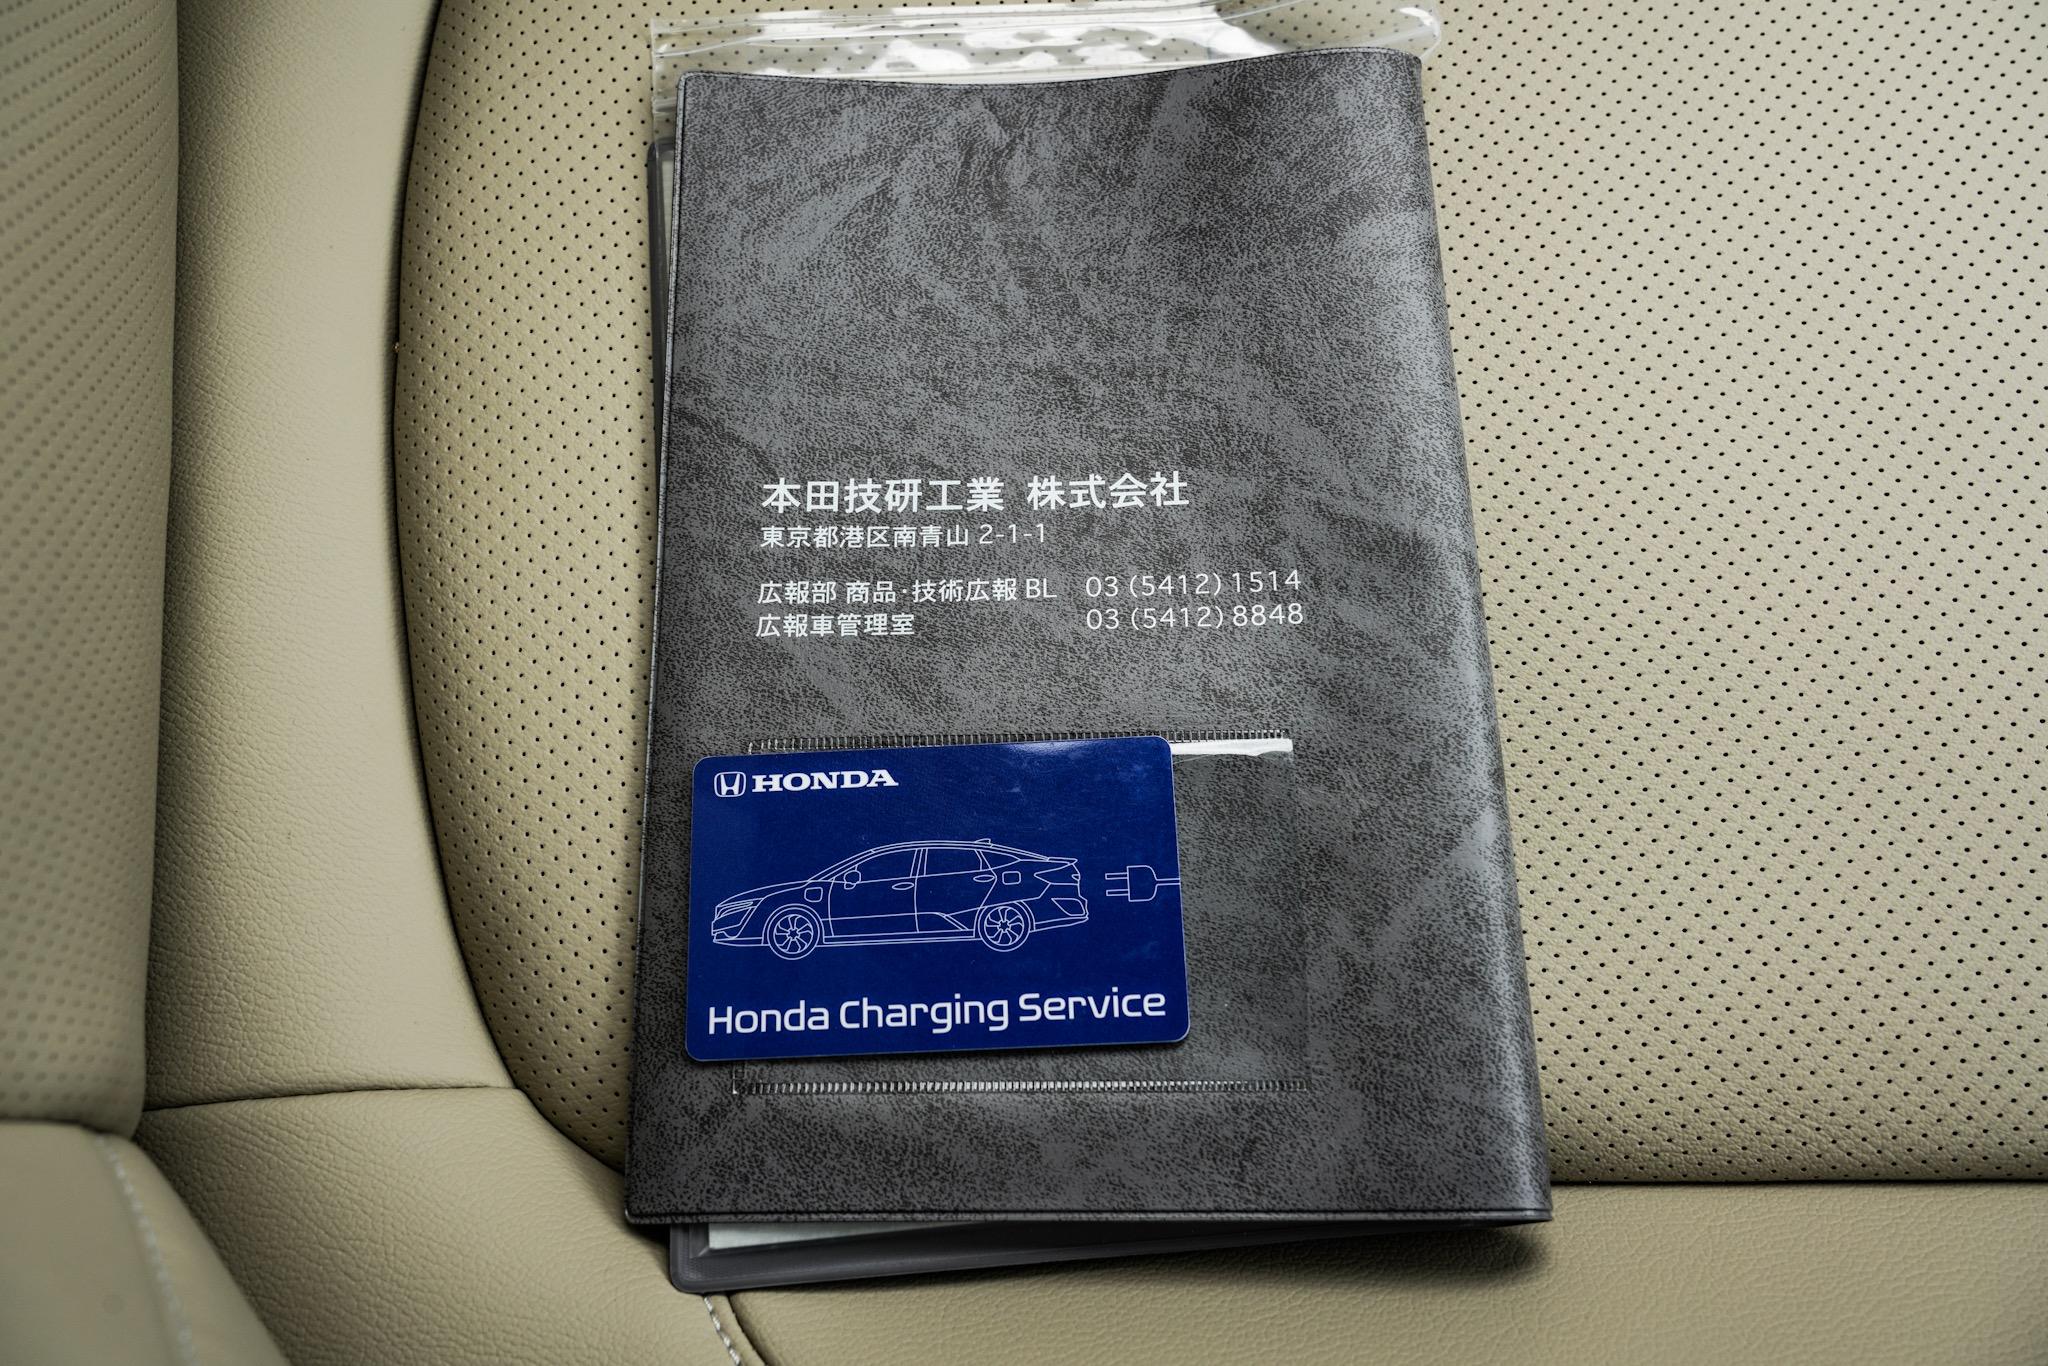 「Honda Charging Service」充電認証カード